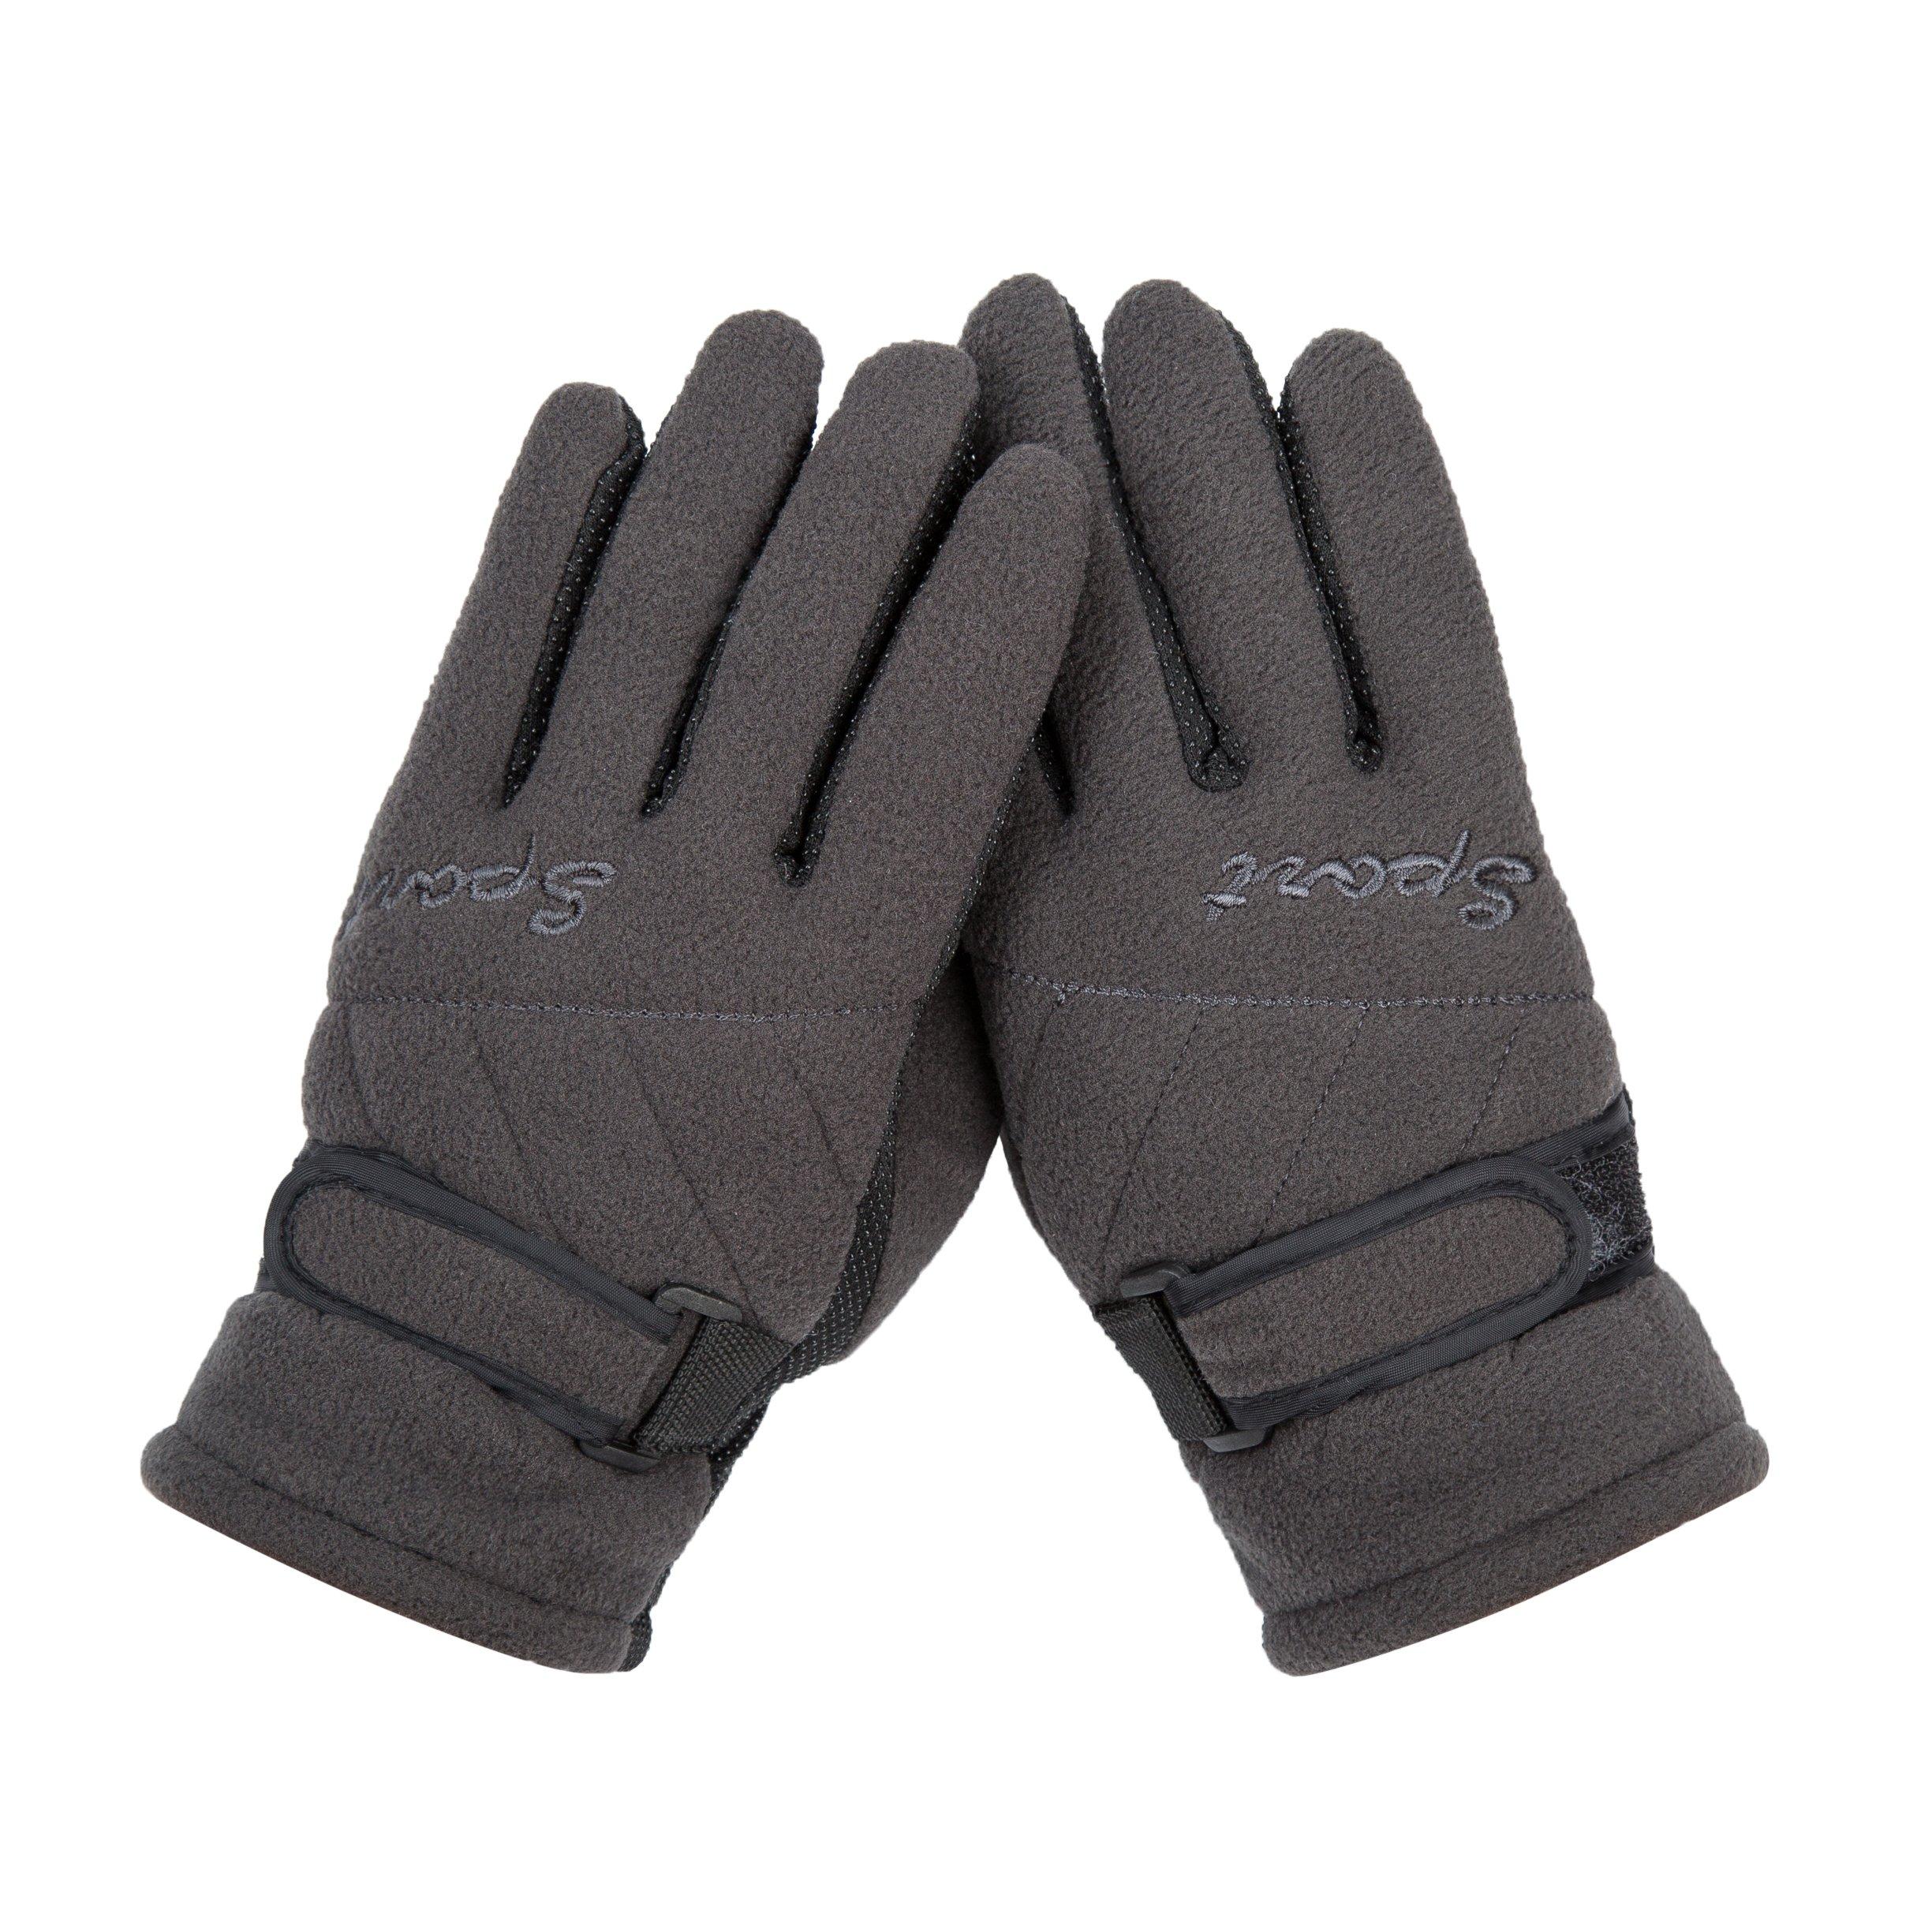 Grey Winter Thinsulate Ski Gloves Anti Slip For teen boy girls